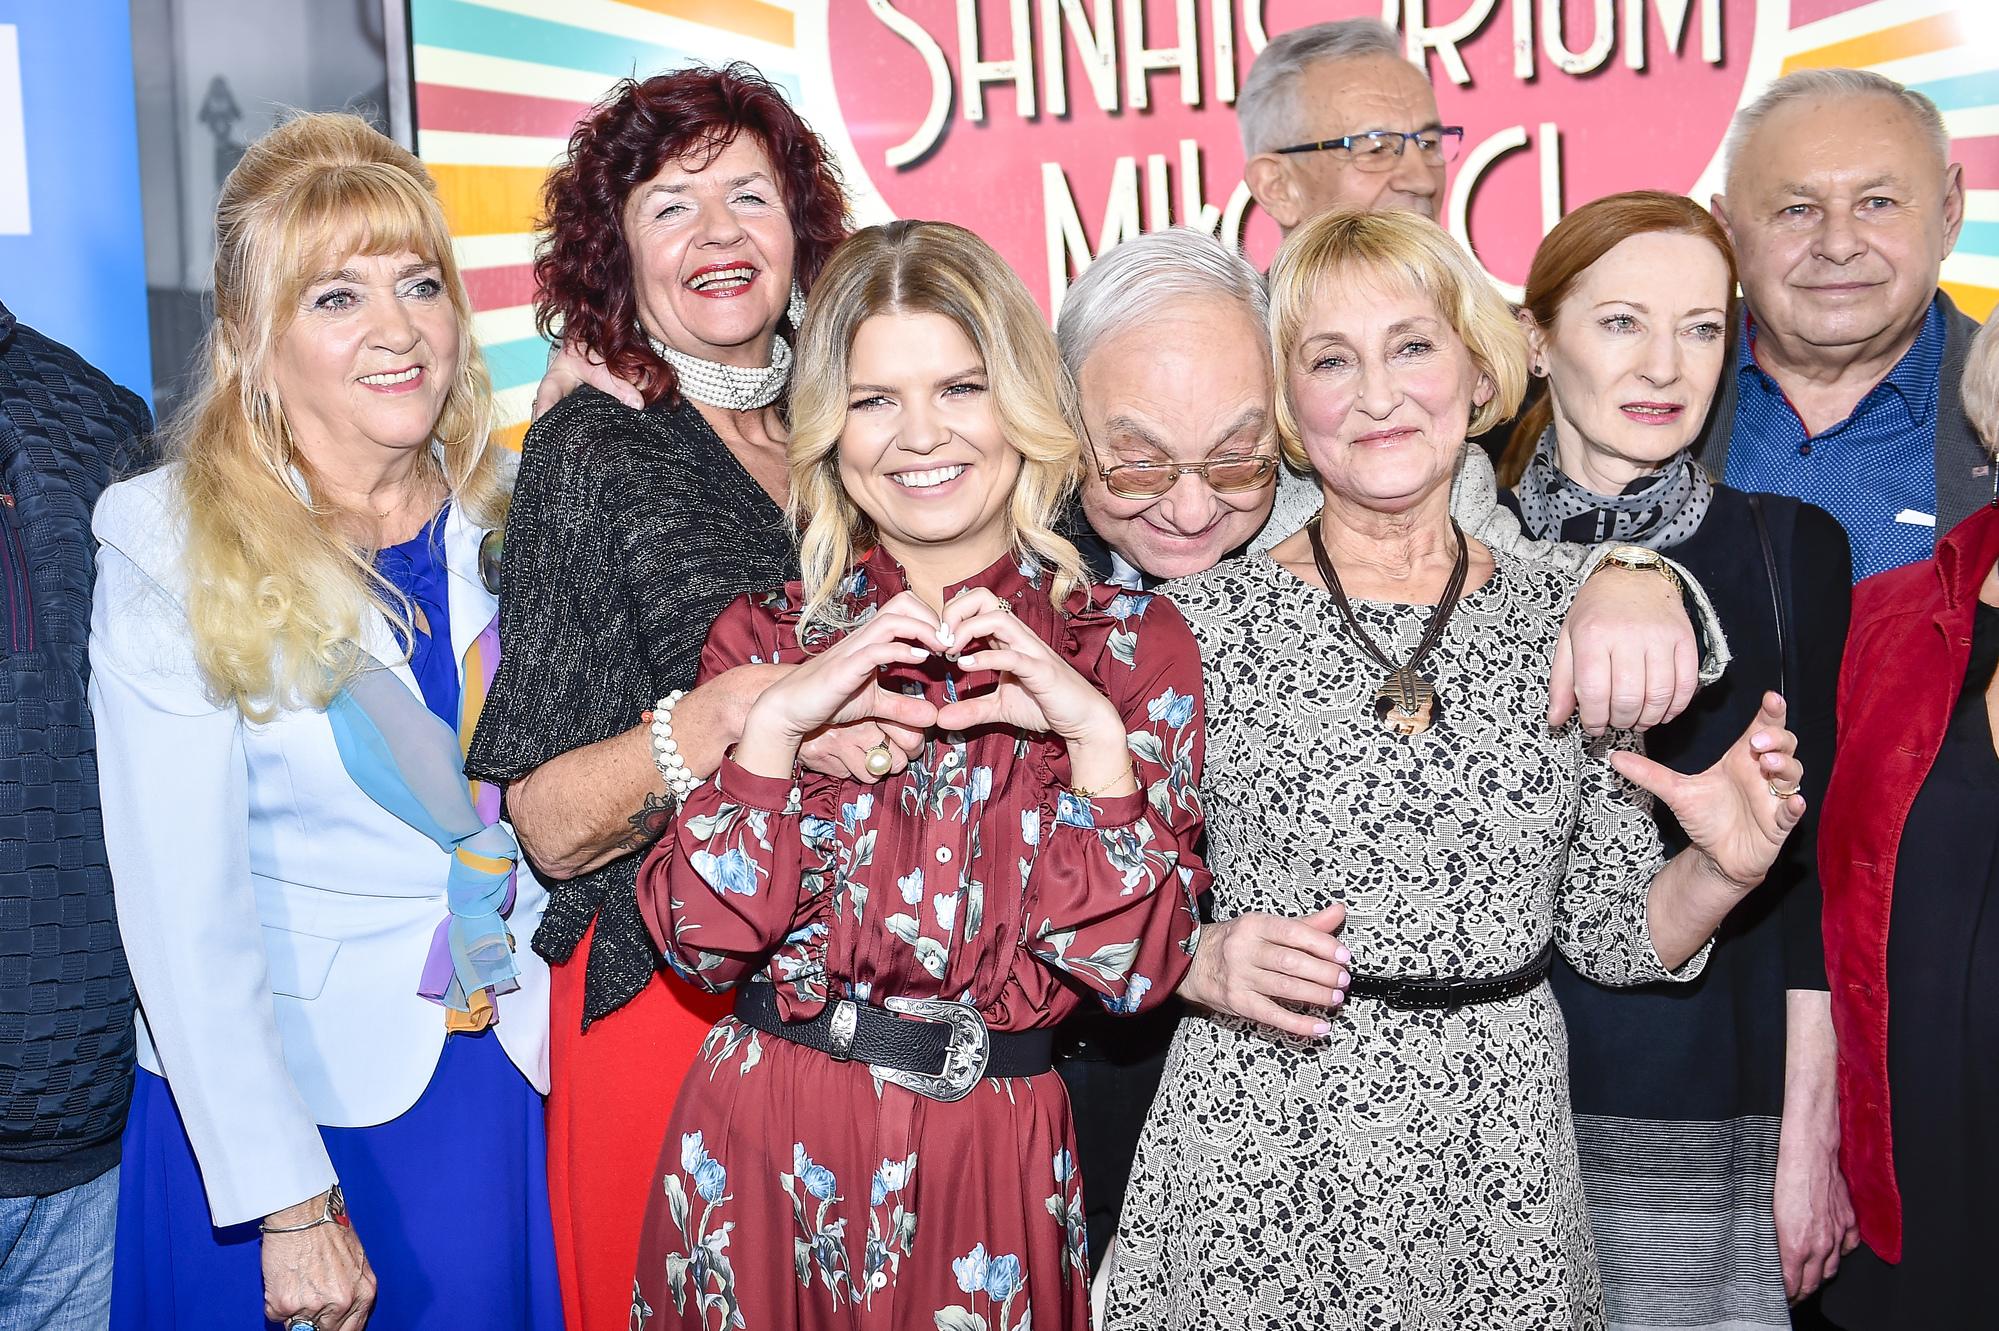 Uczestnicy programu Sanatorium miłości